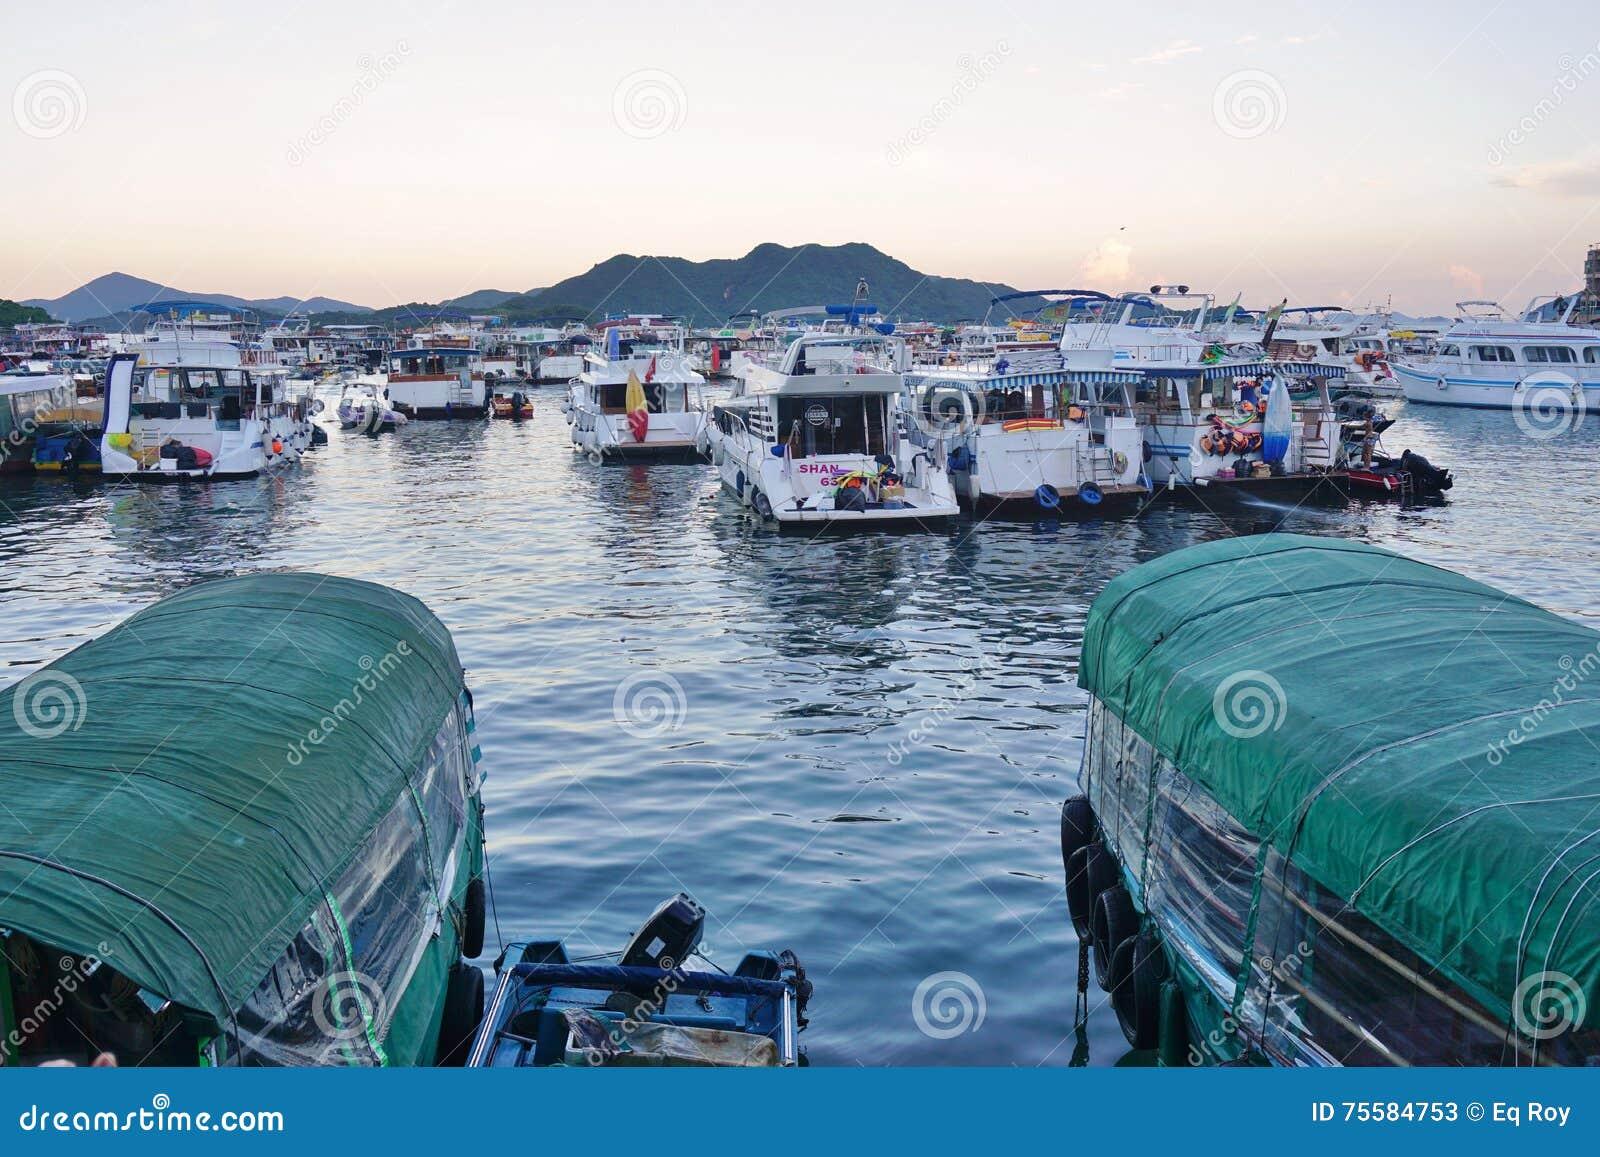 Sai Kung στα νέα εδάφη του Χονγκ Κονγκ